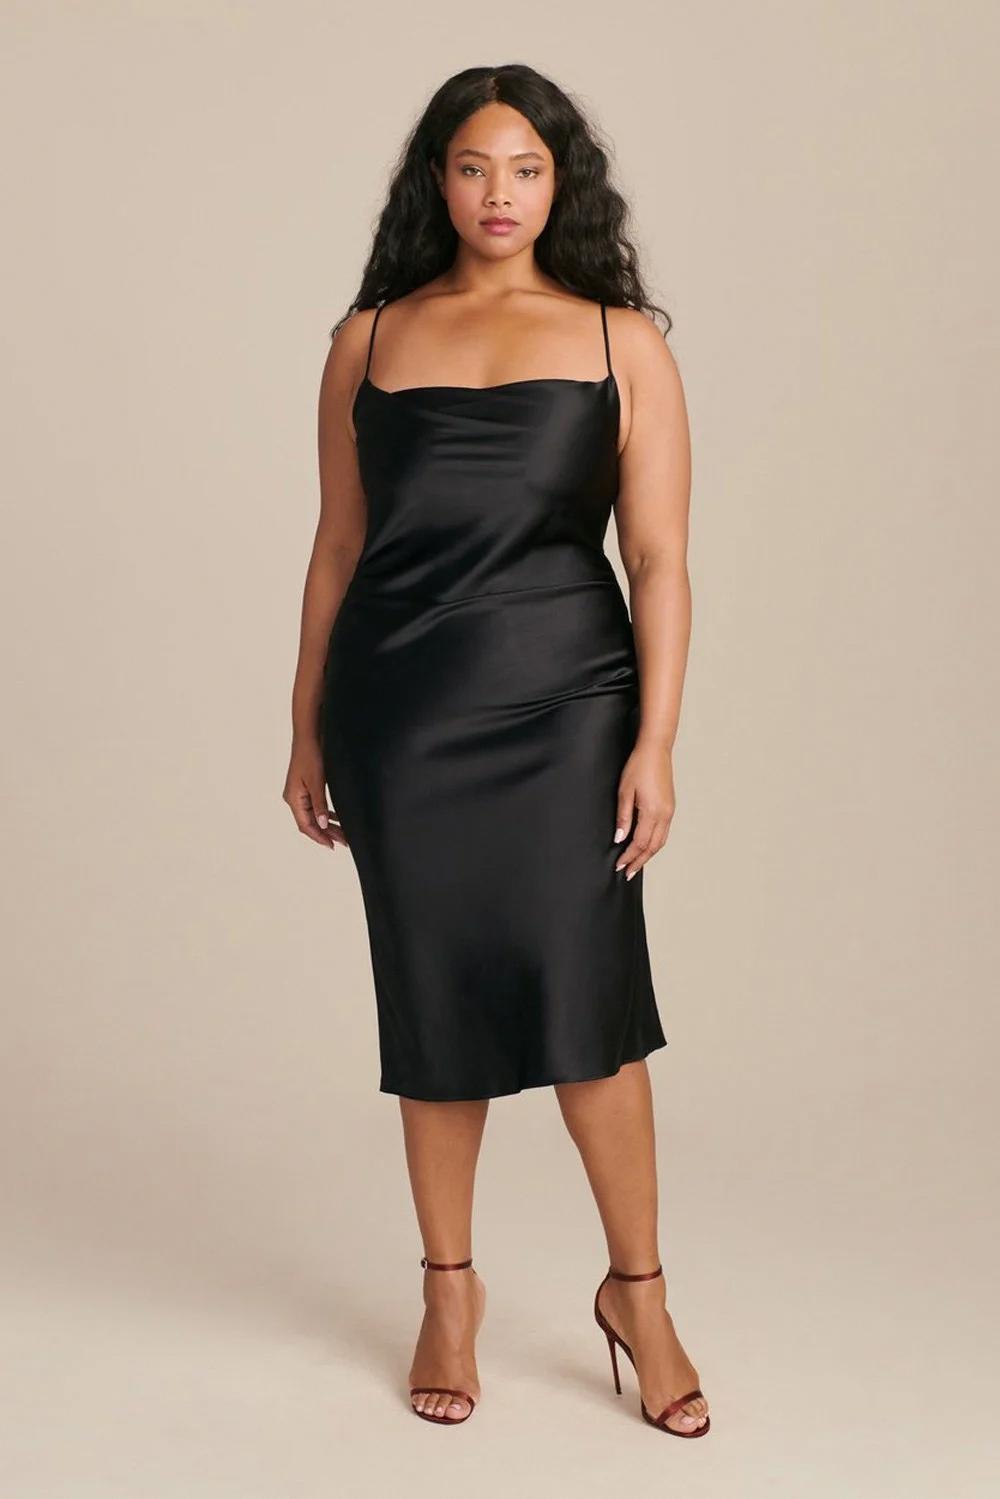 34++ Plus size slip dress ideas information